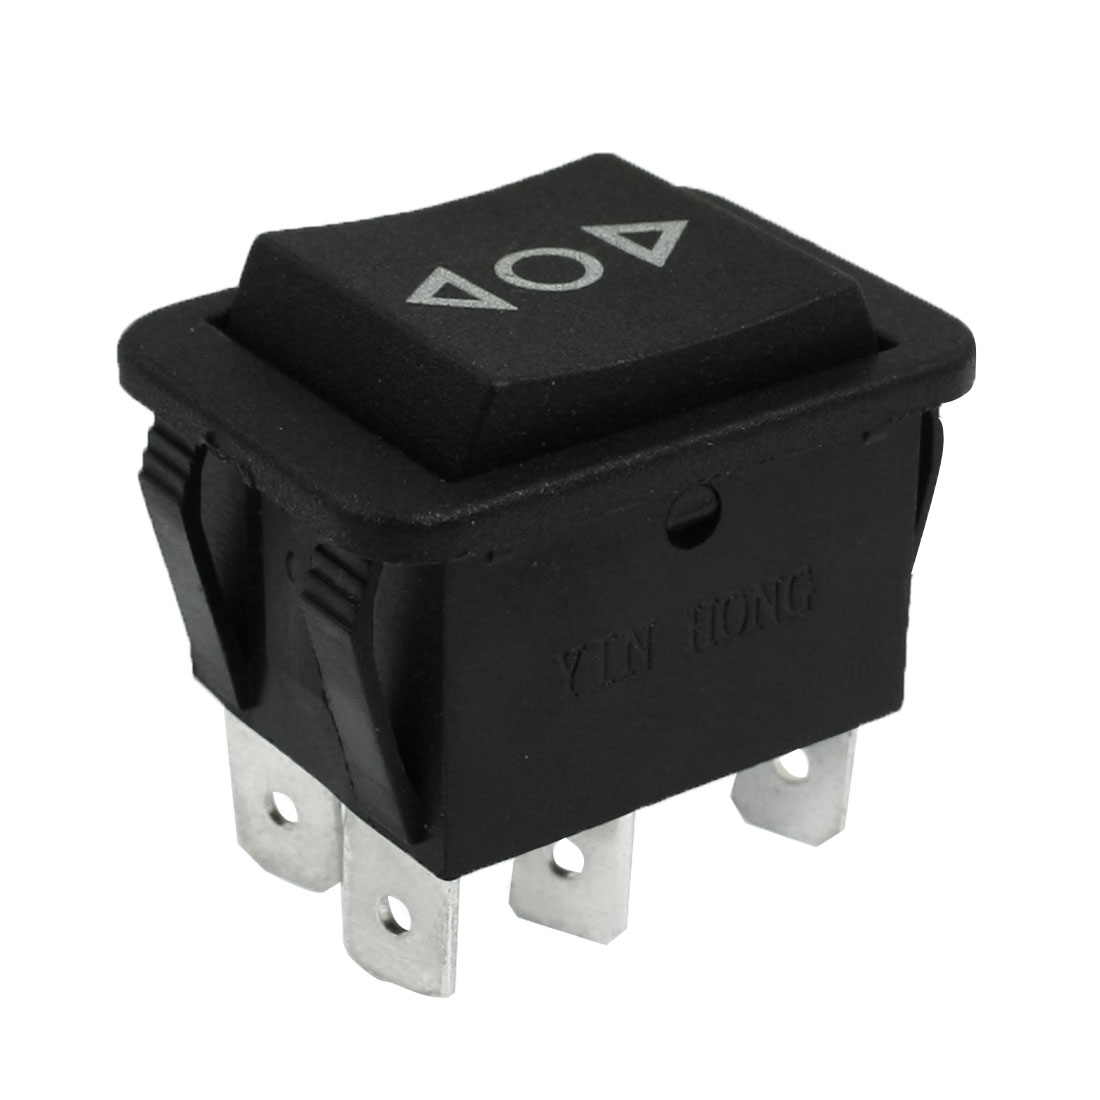 AC 250V/10A 125V/15A 6 Pins On-Off-On Momentary Rocker Switch